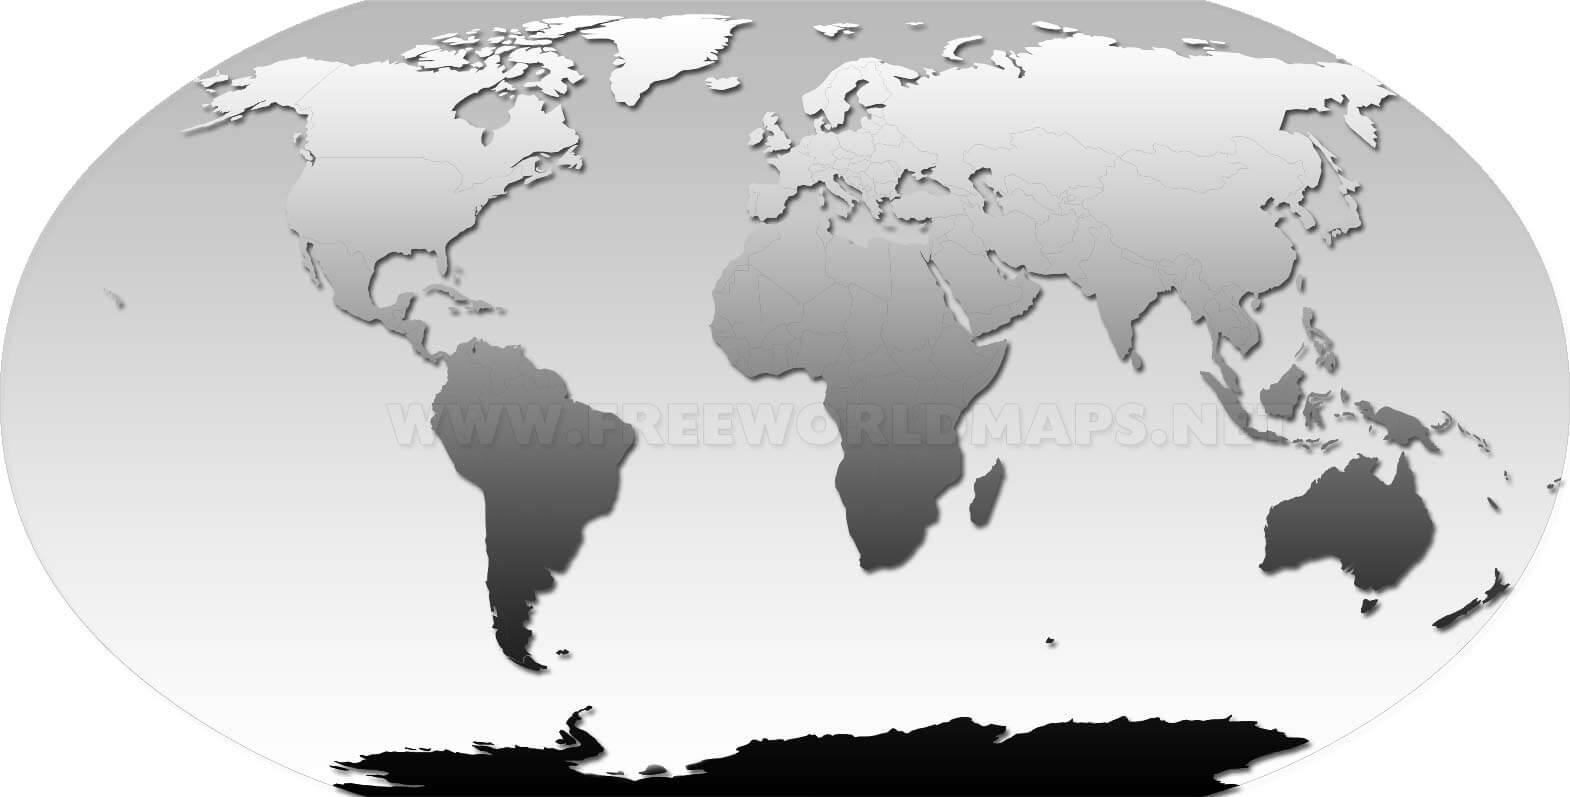 Pases del mundo  Mapa en espaol